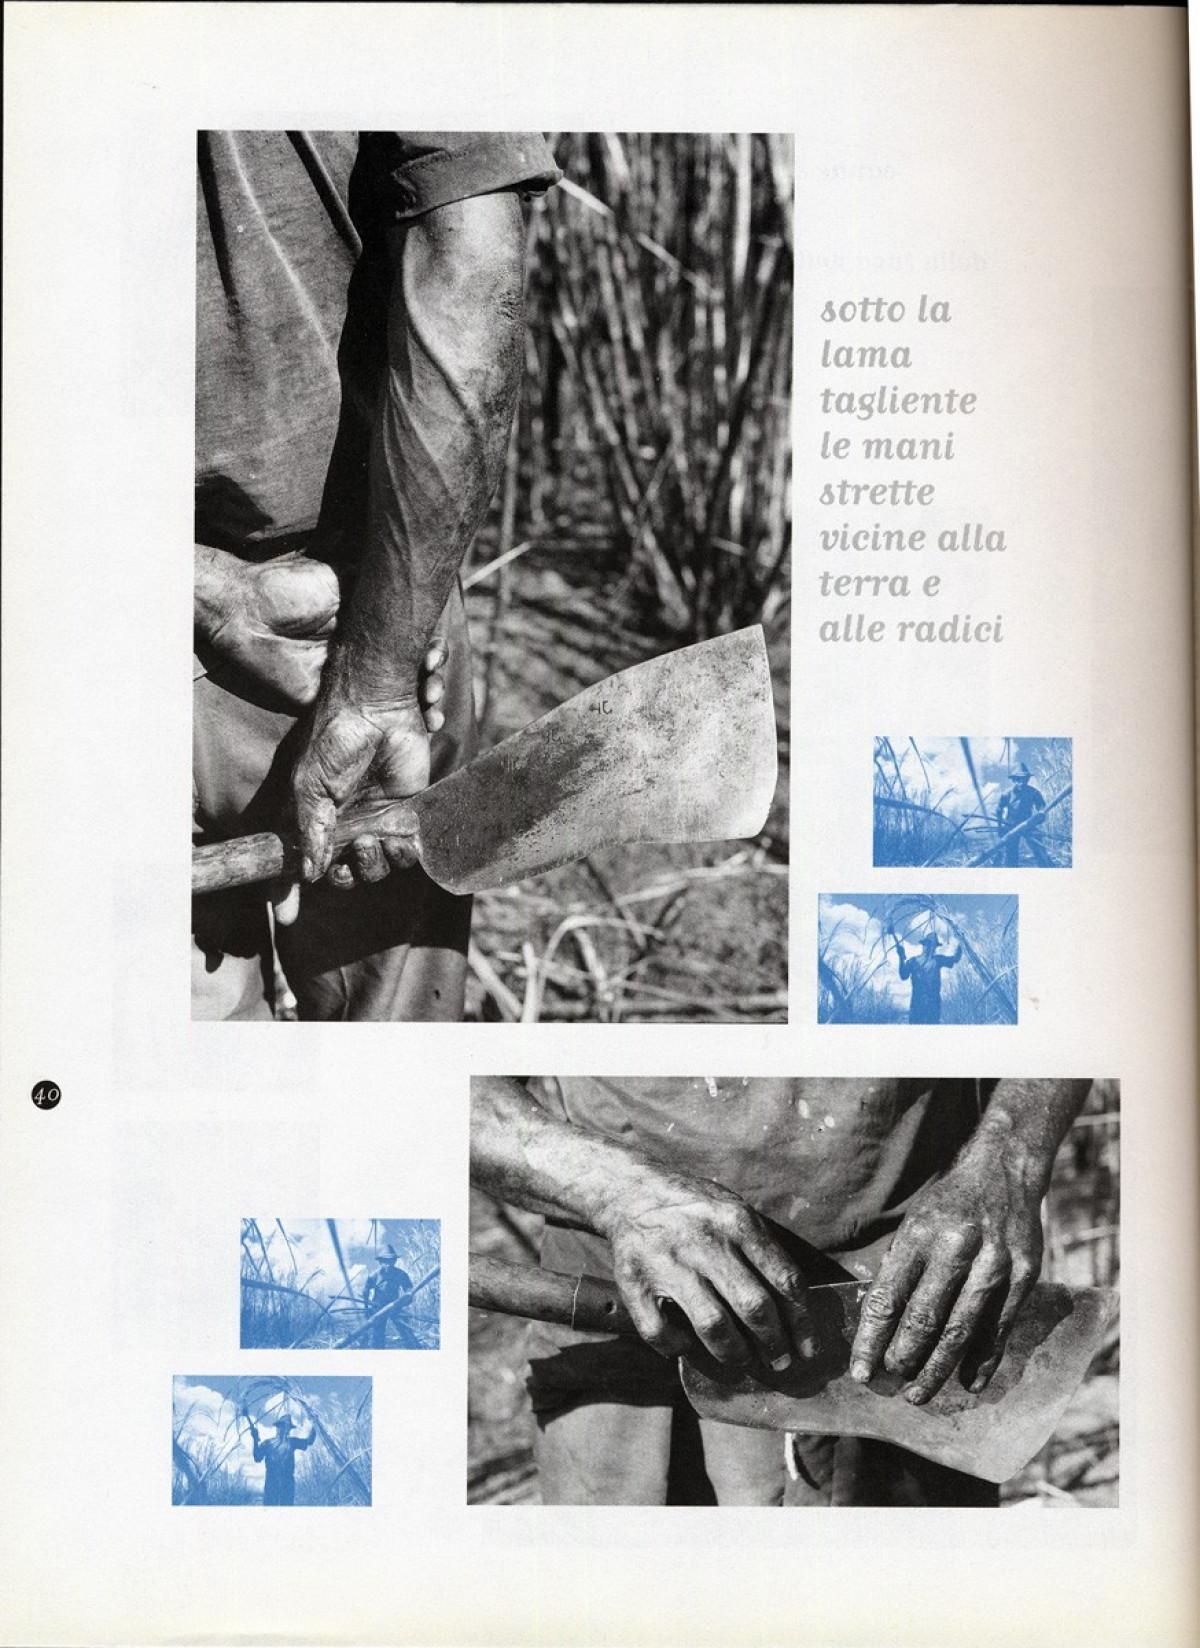 1997 - Sugarcane cutters - Linea d'ombra